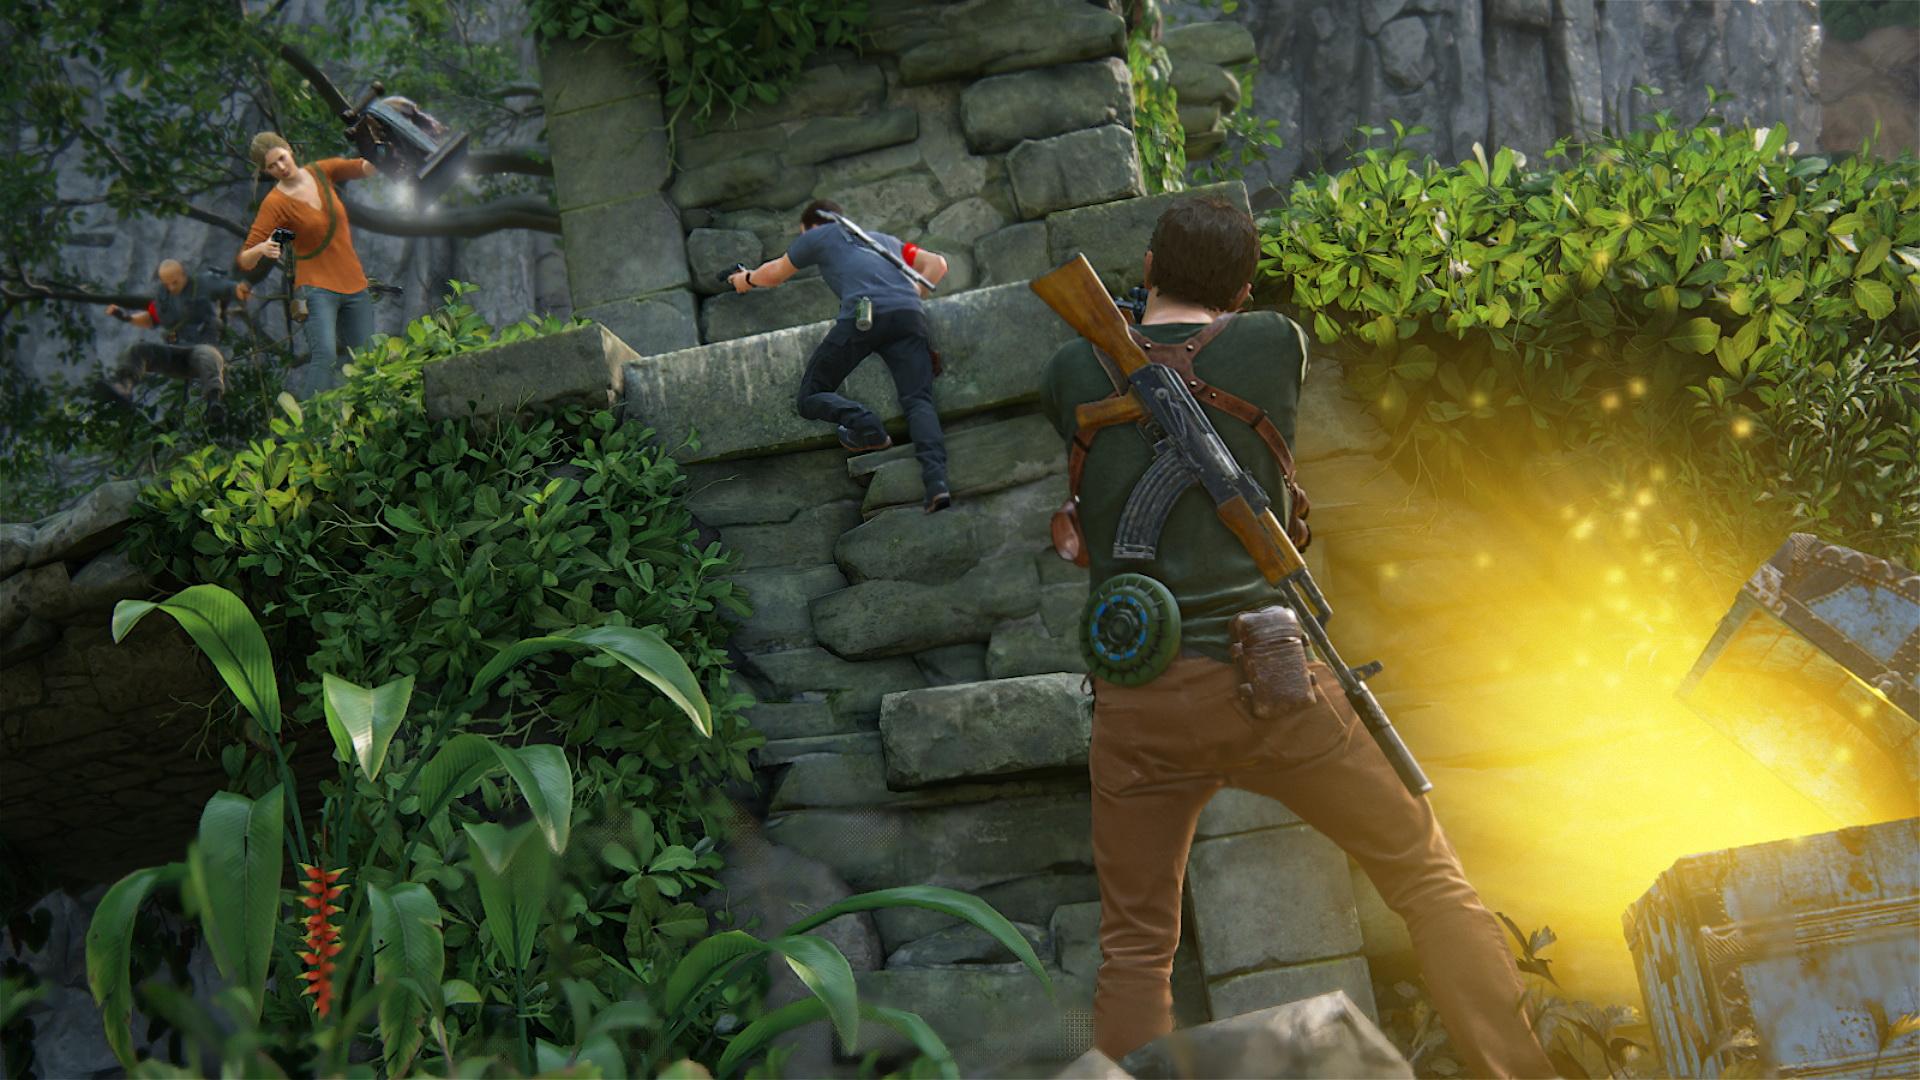 Uncharted4-AThief-sEnd PS4 Editeur 090